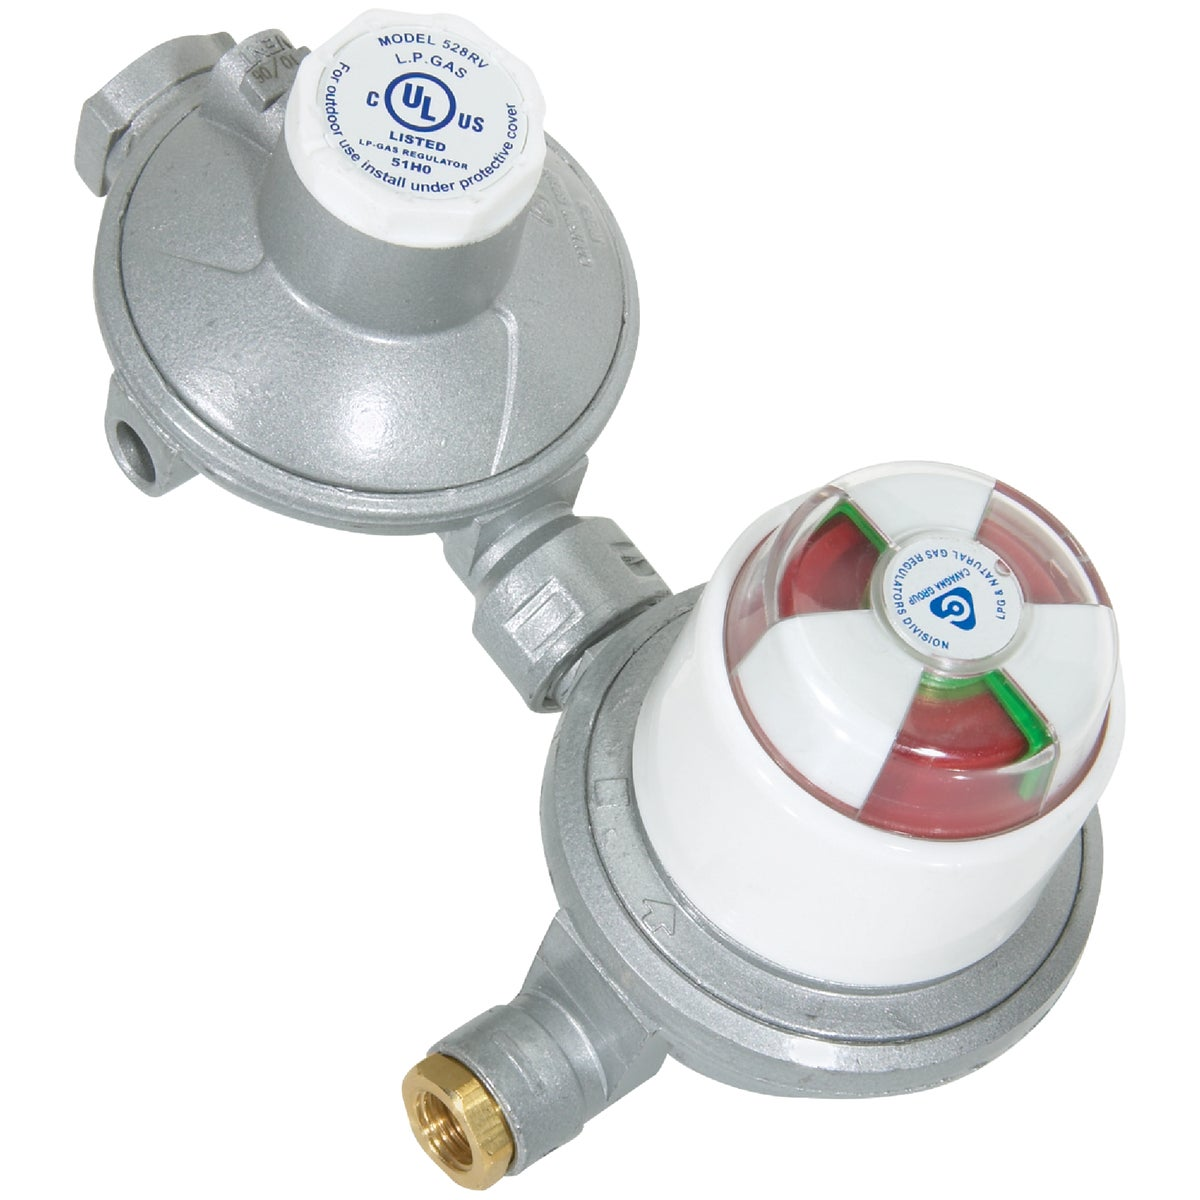 Mr. Heater LP GAS REGULATOR F273766